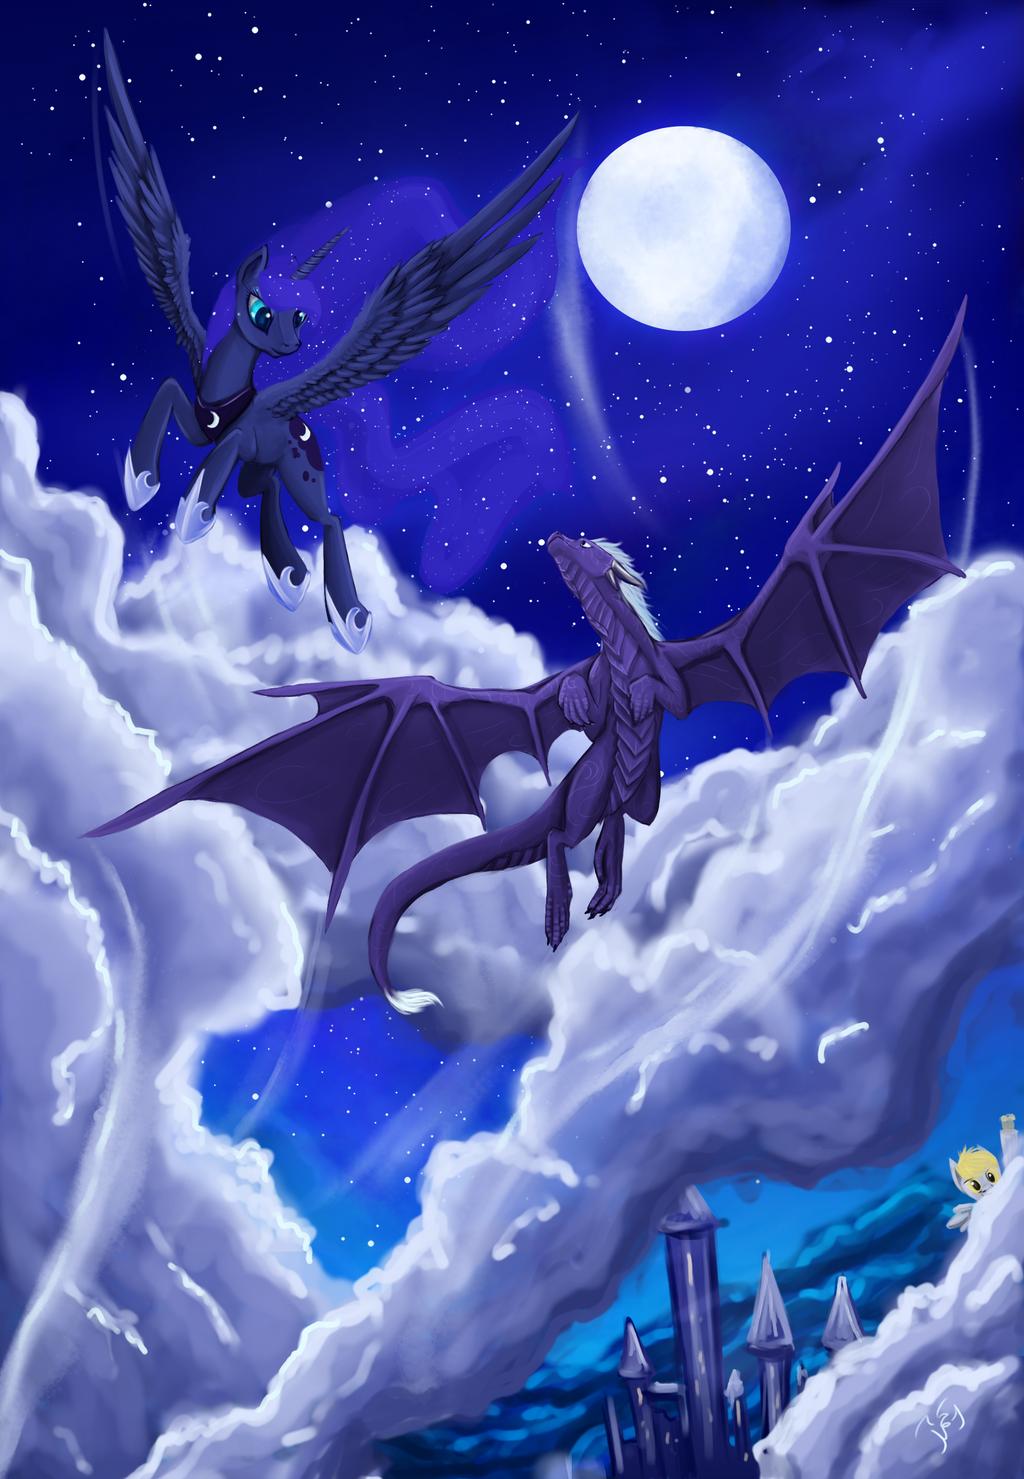 dream_fly_by_dalagar-d5ysamj.png